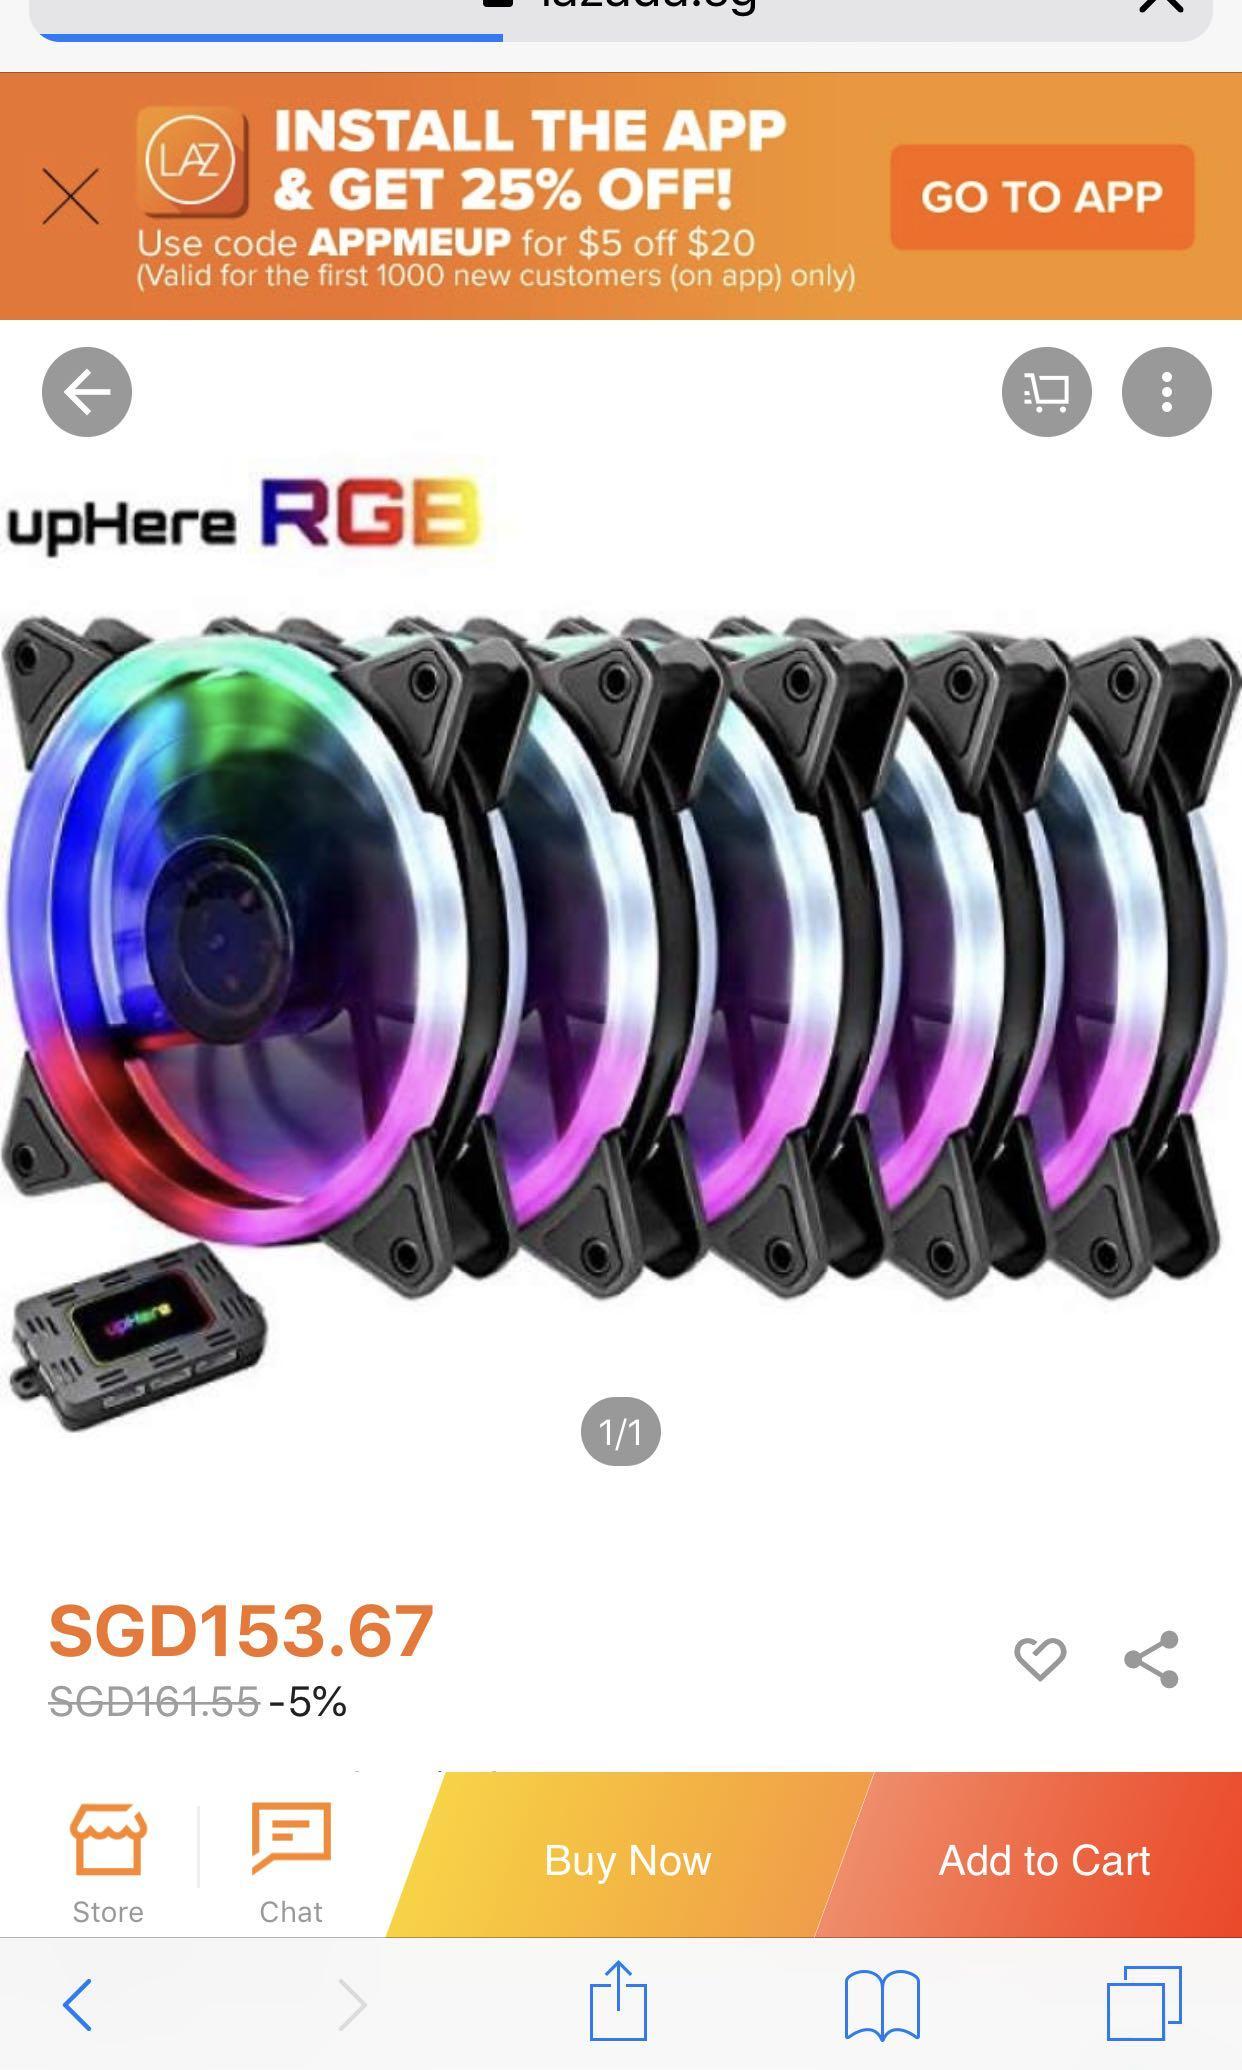 5pcs RGB Fans with remote, Electronics, Computer Parts